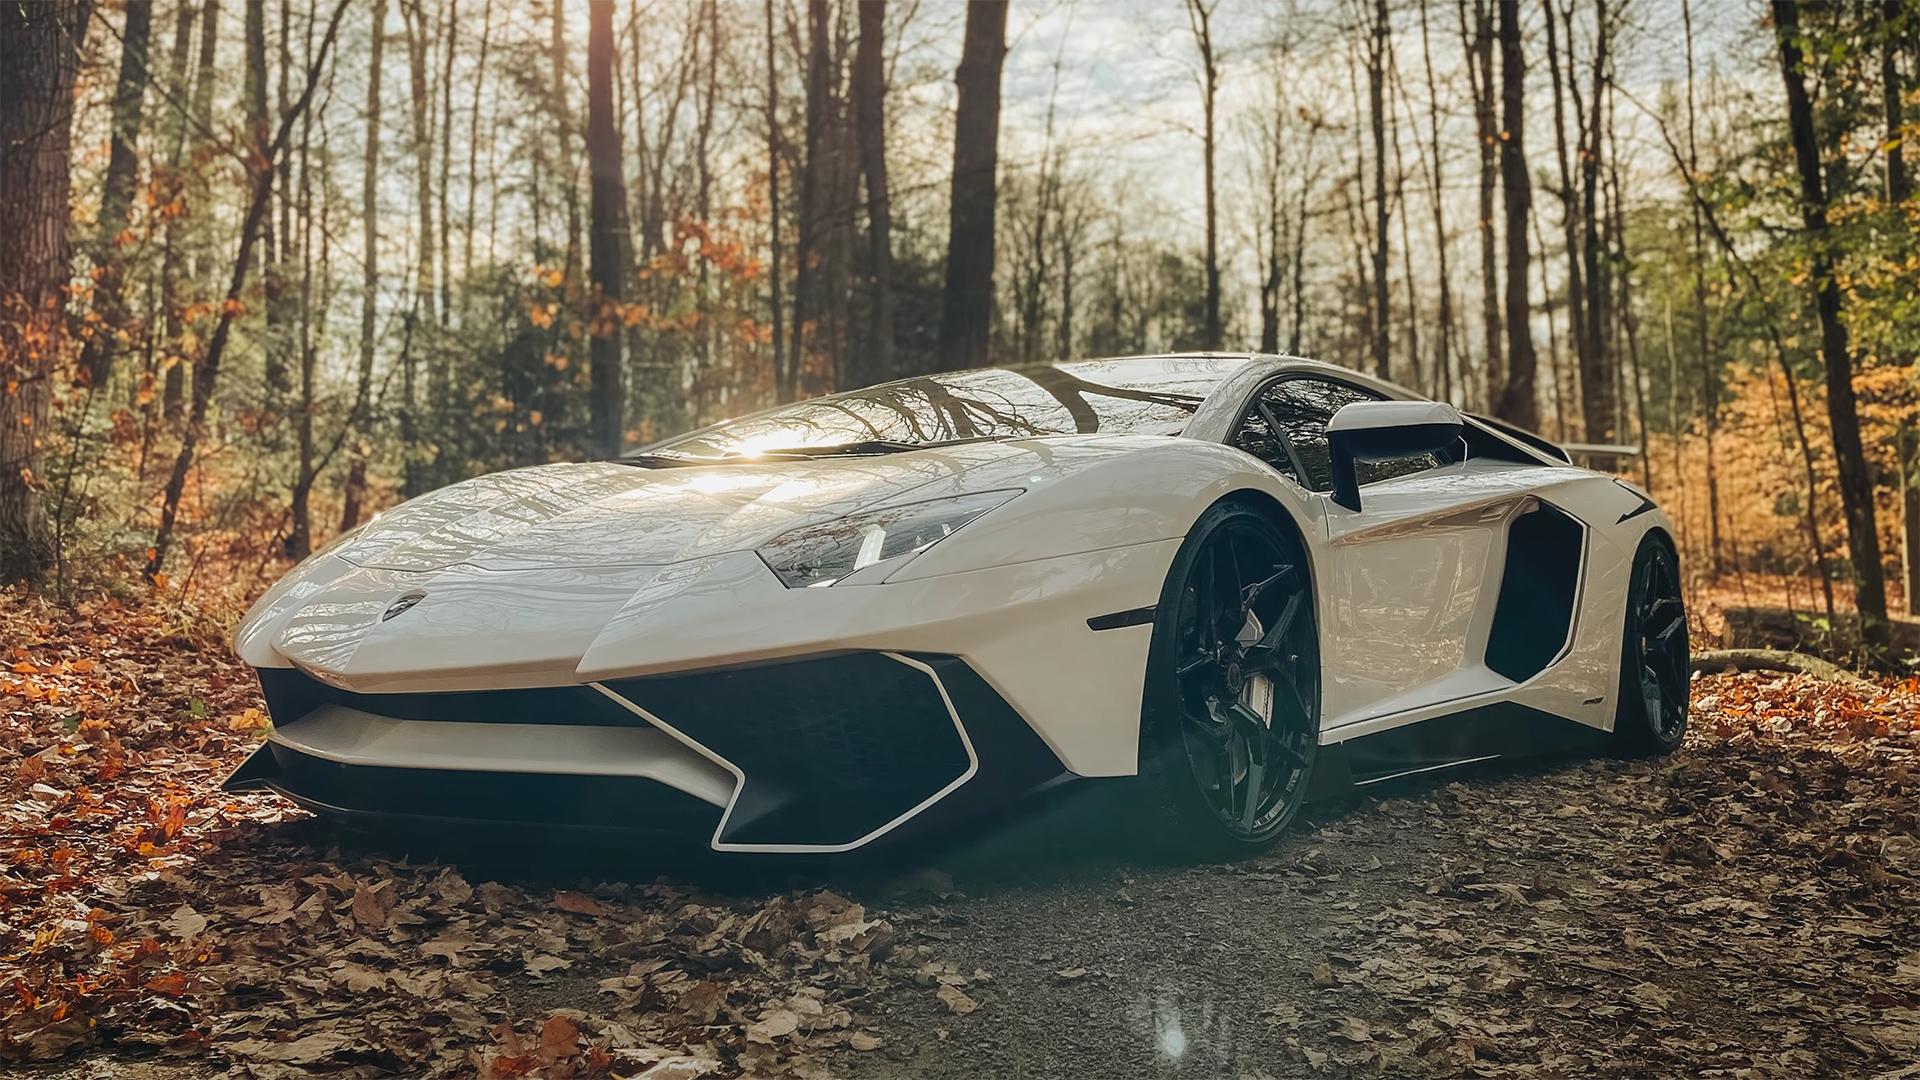 Lamborghini taken with iPhone 12 Pro Max. Image: Peter McKinnon screen grab.